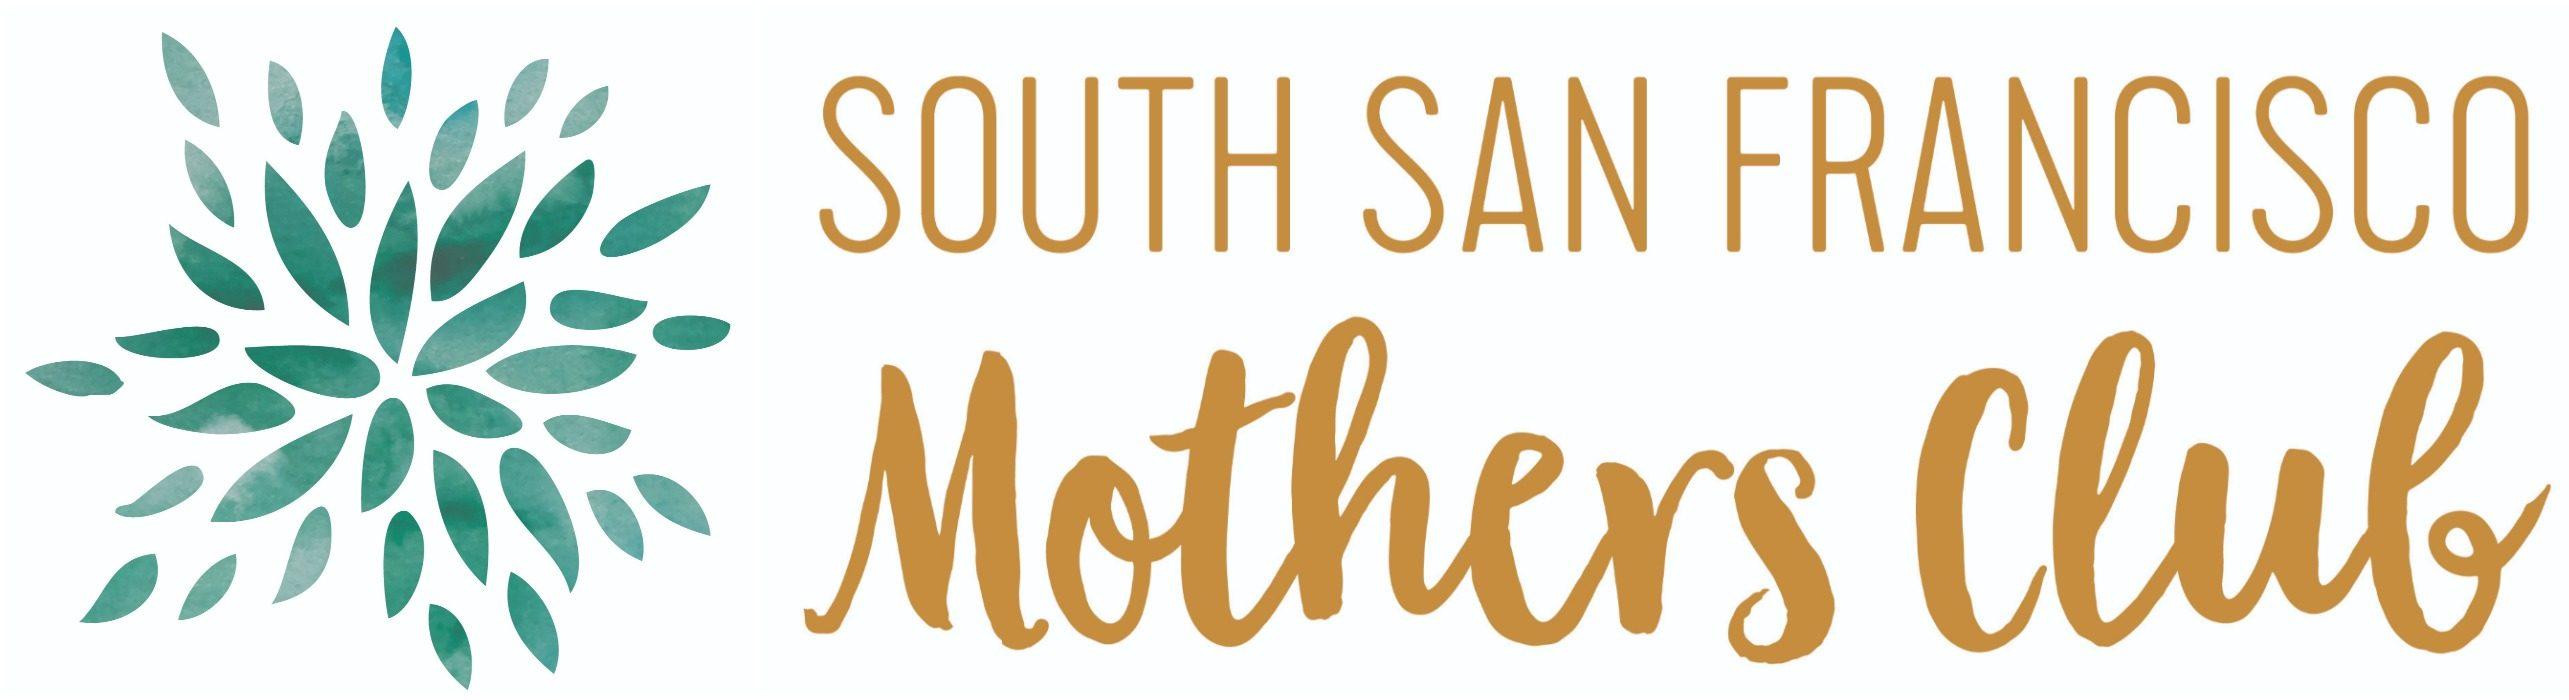 South San Francisco Mothers Club